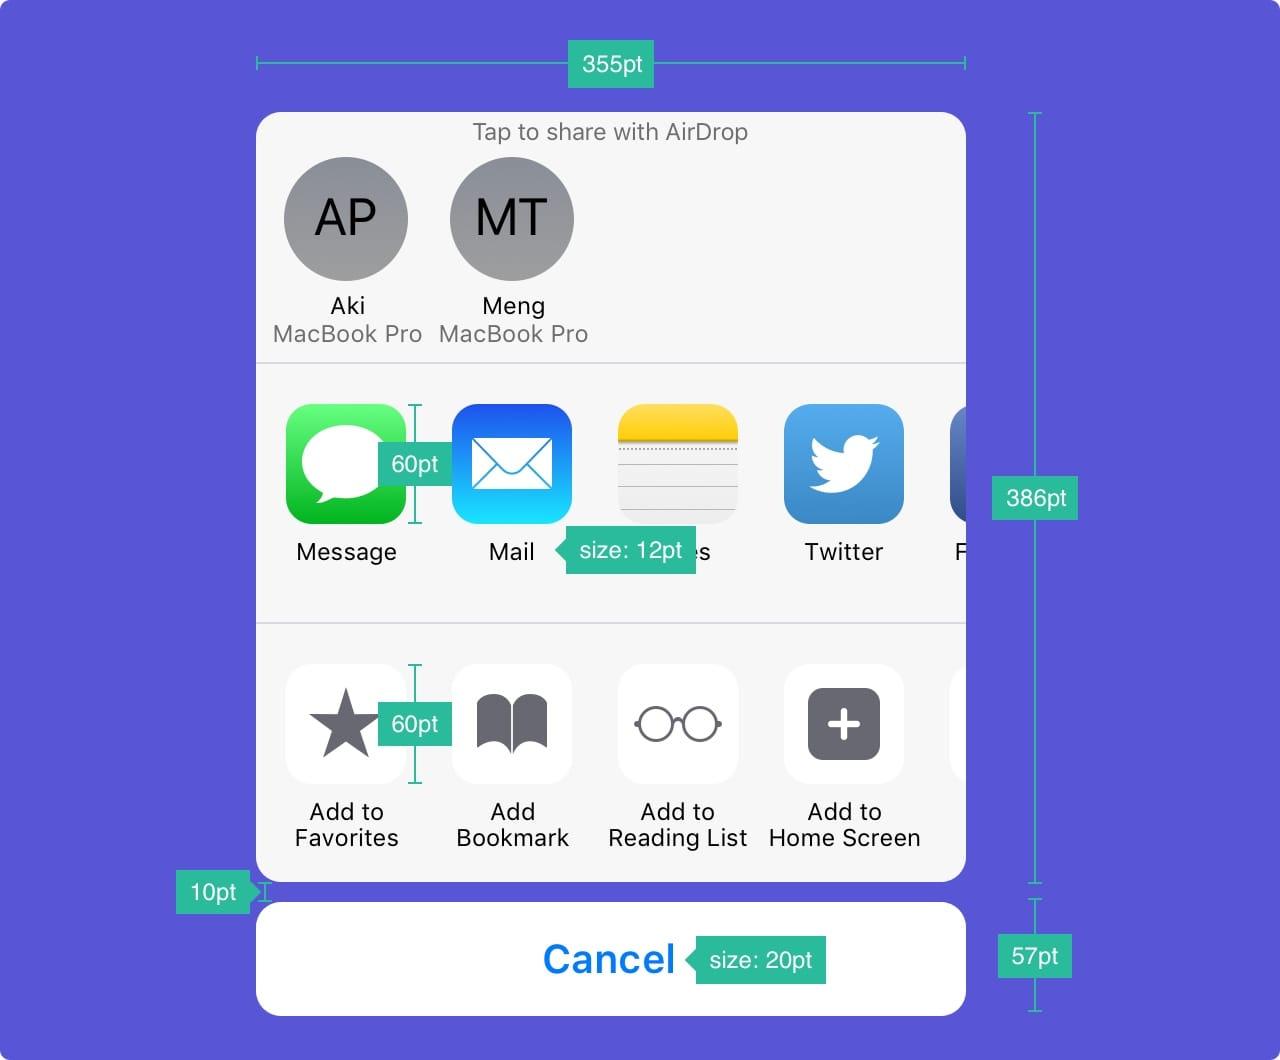 Дизайн под iPhone X. Гайдлайны для iOS 11 - 32